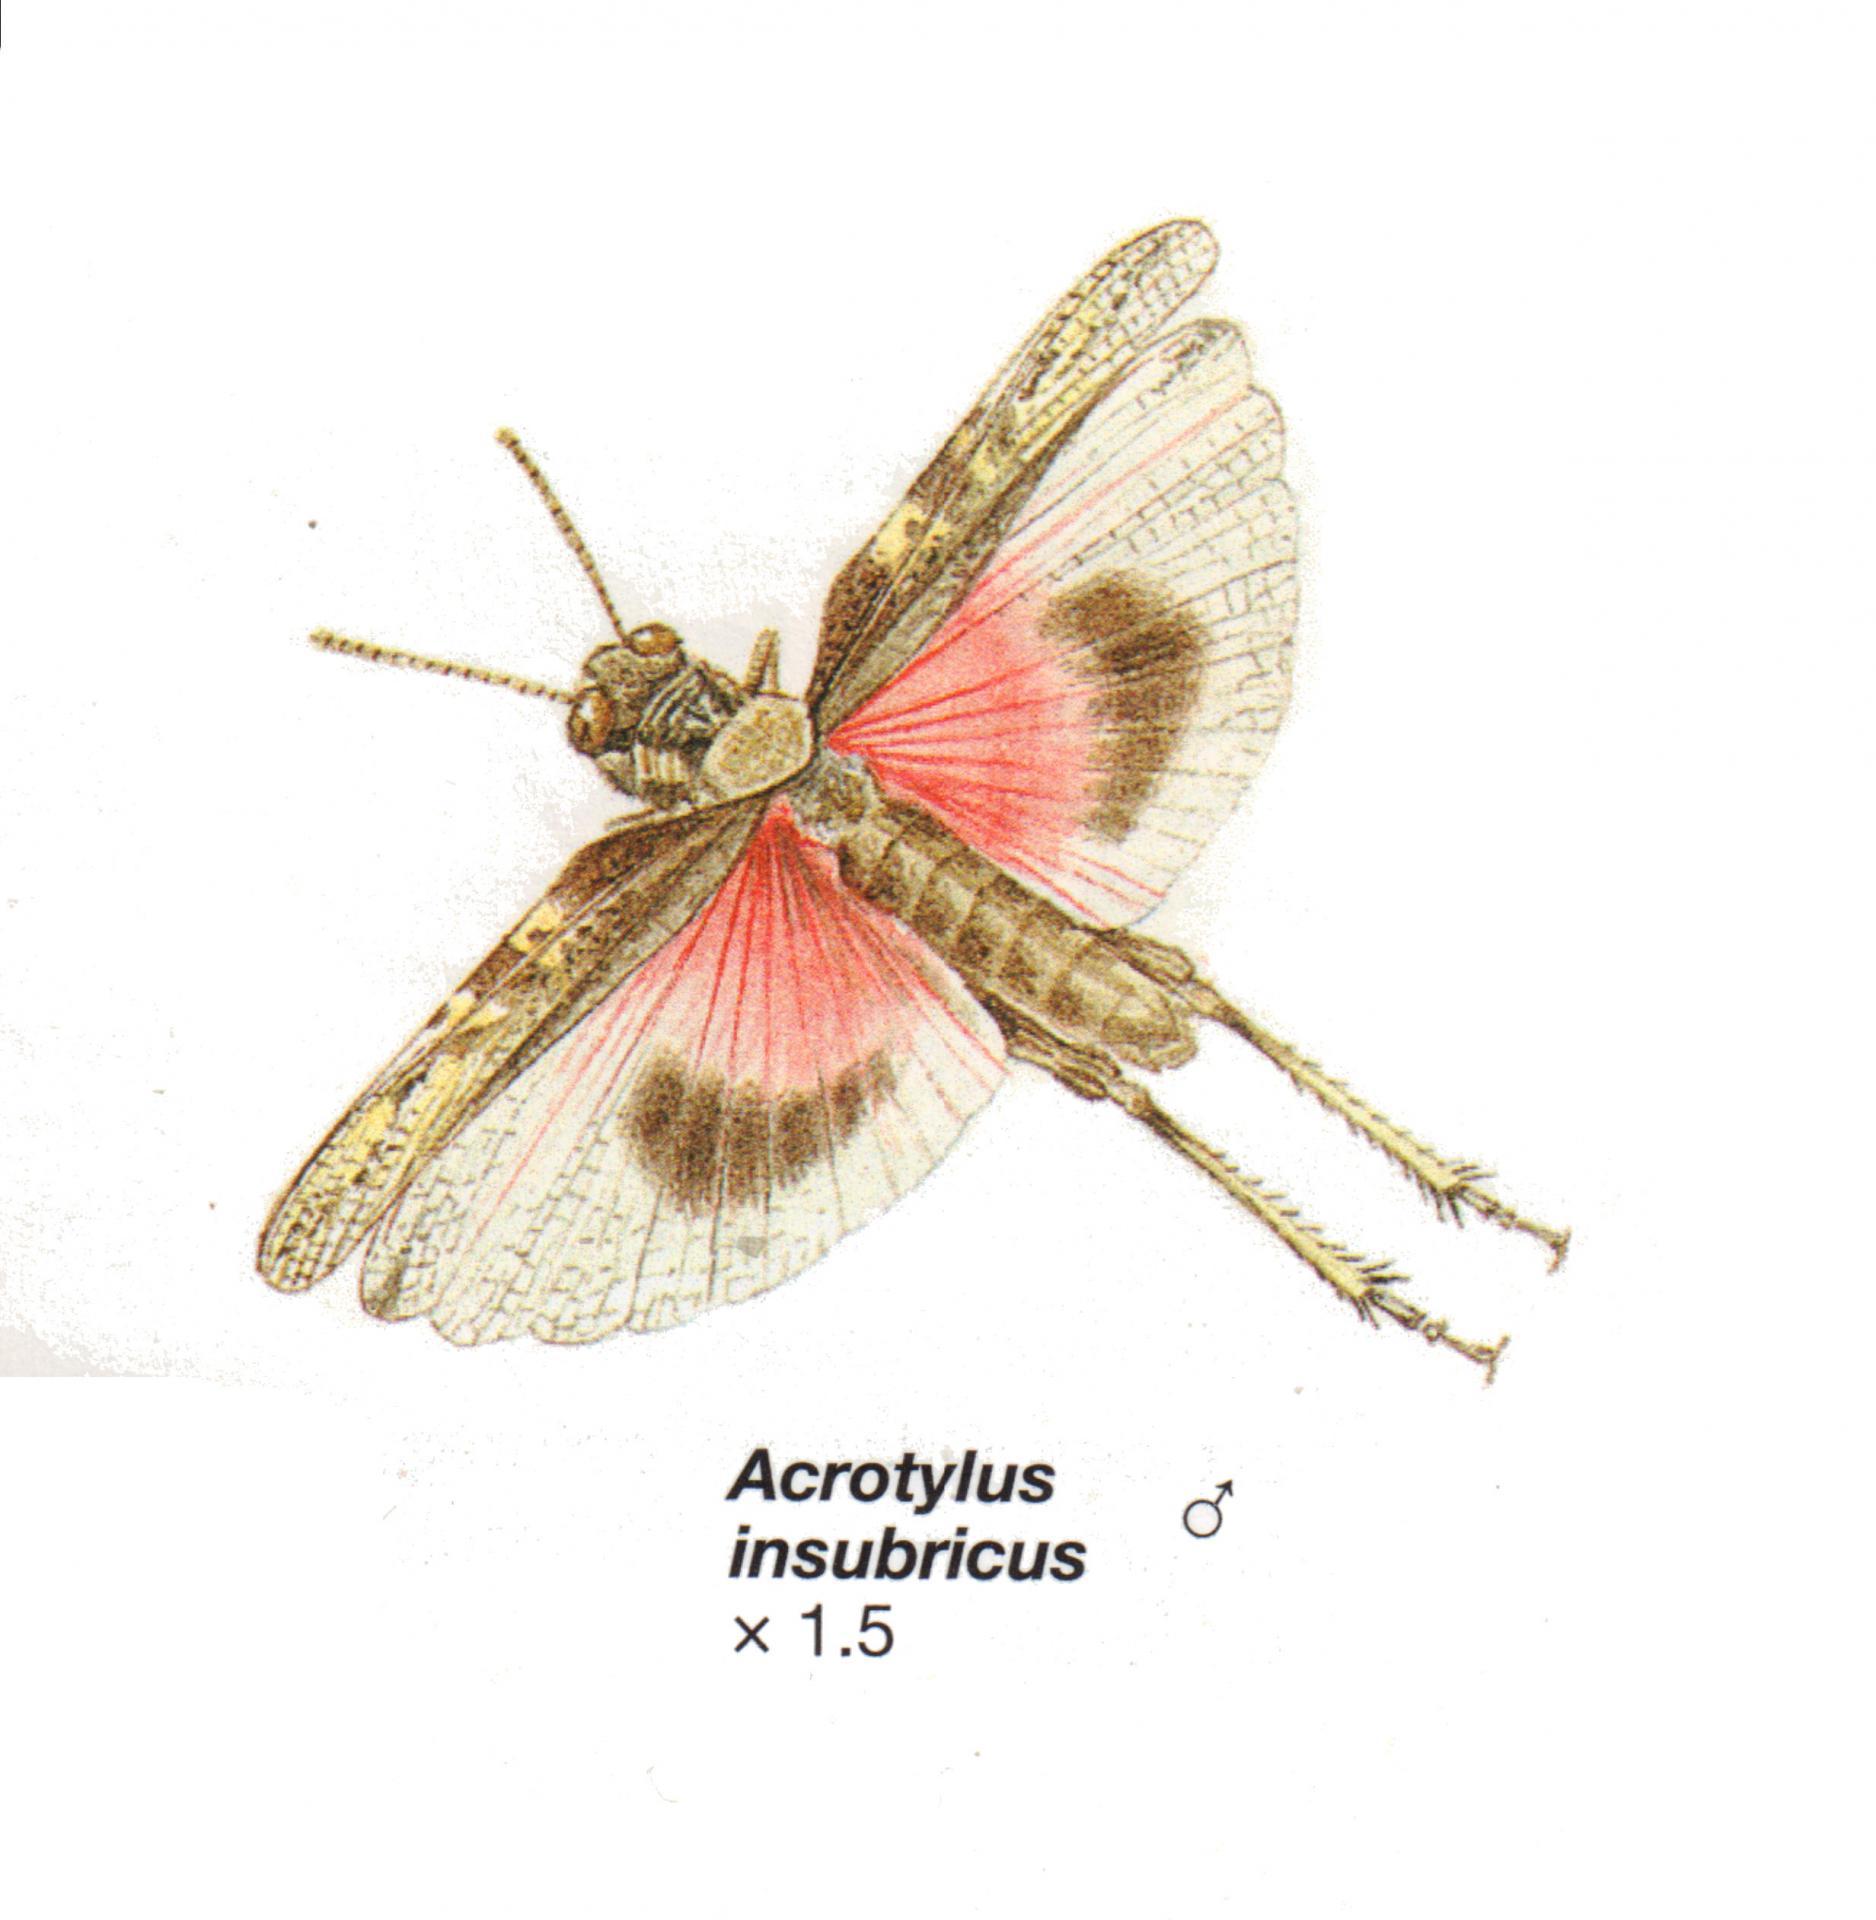 Acrotylus insubricus